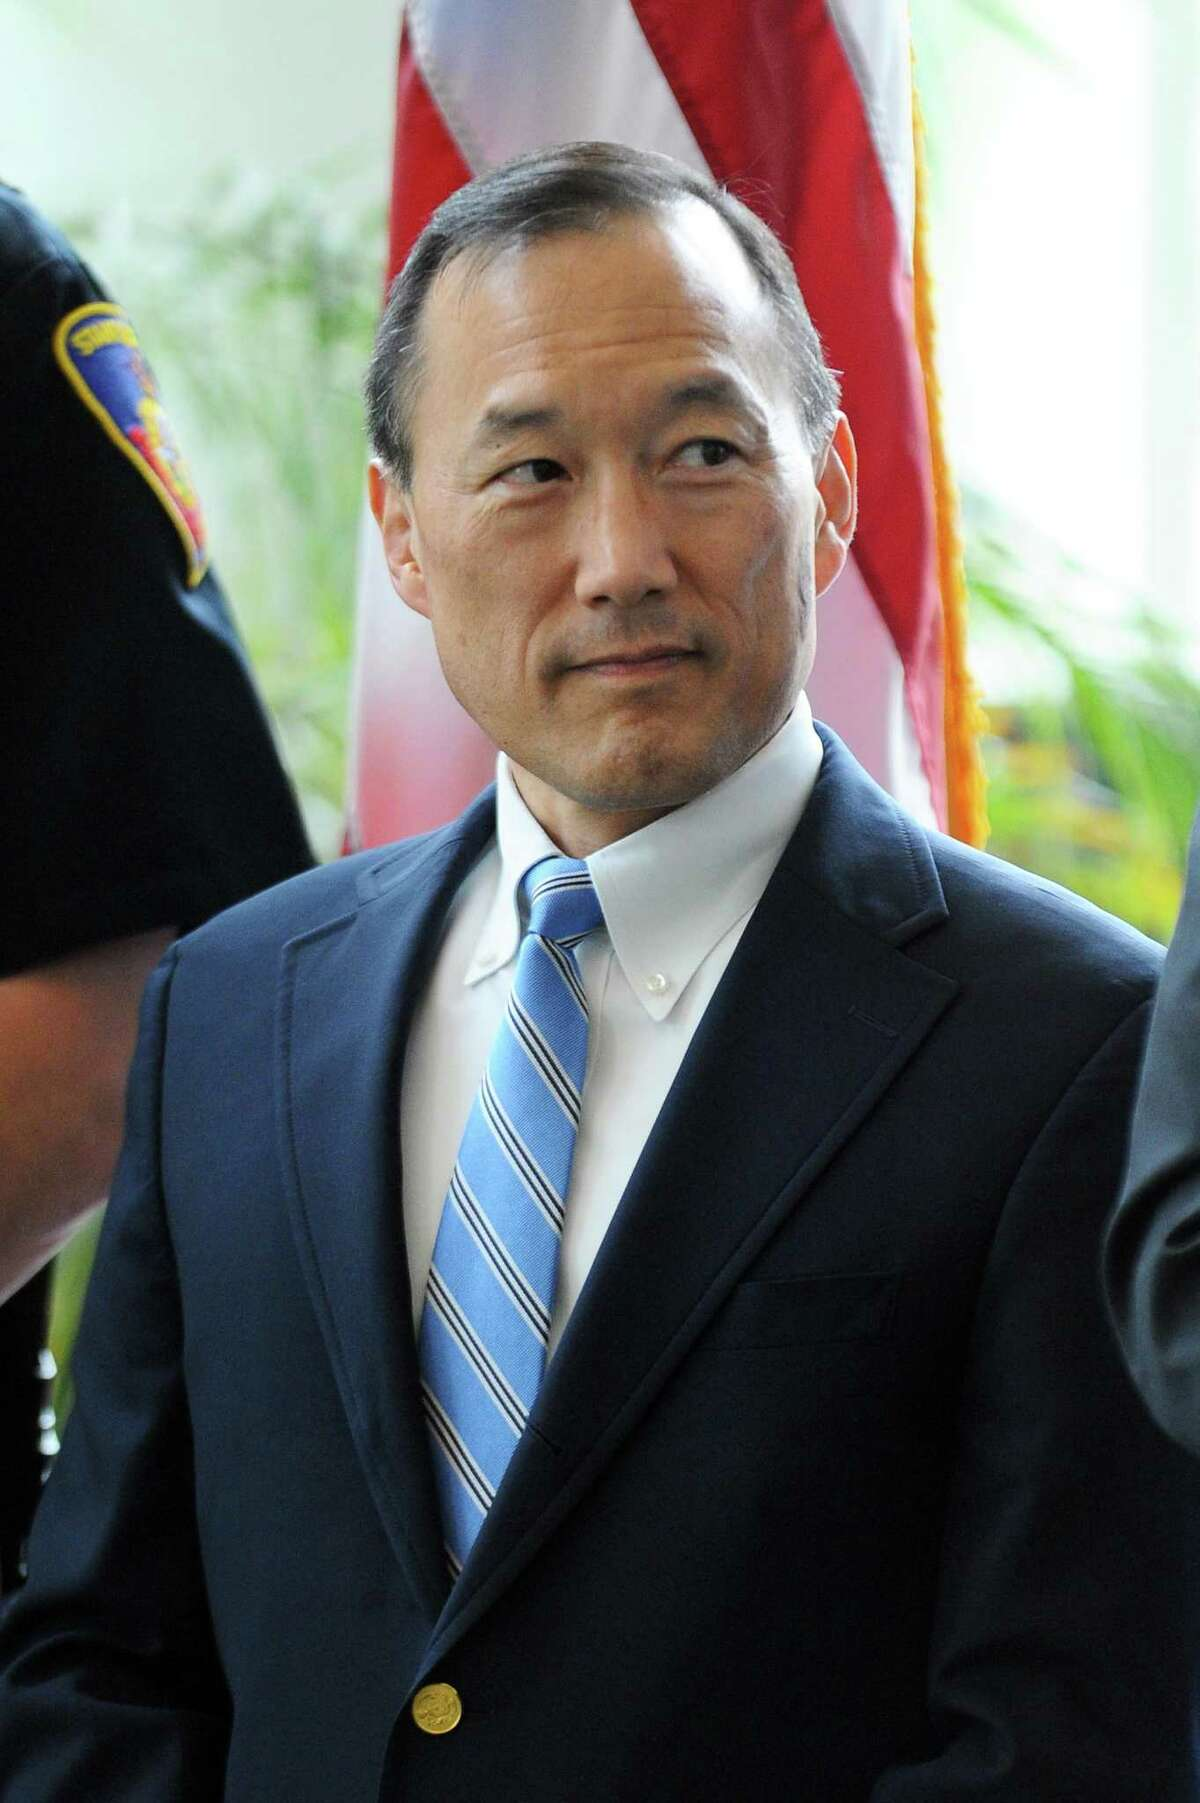 Stamford Superintendent of Schools Earl Kim.